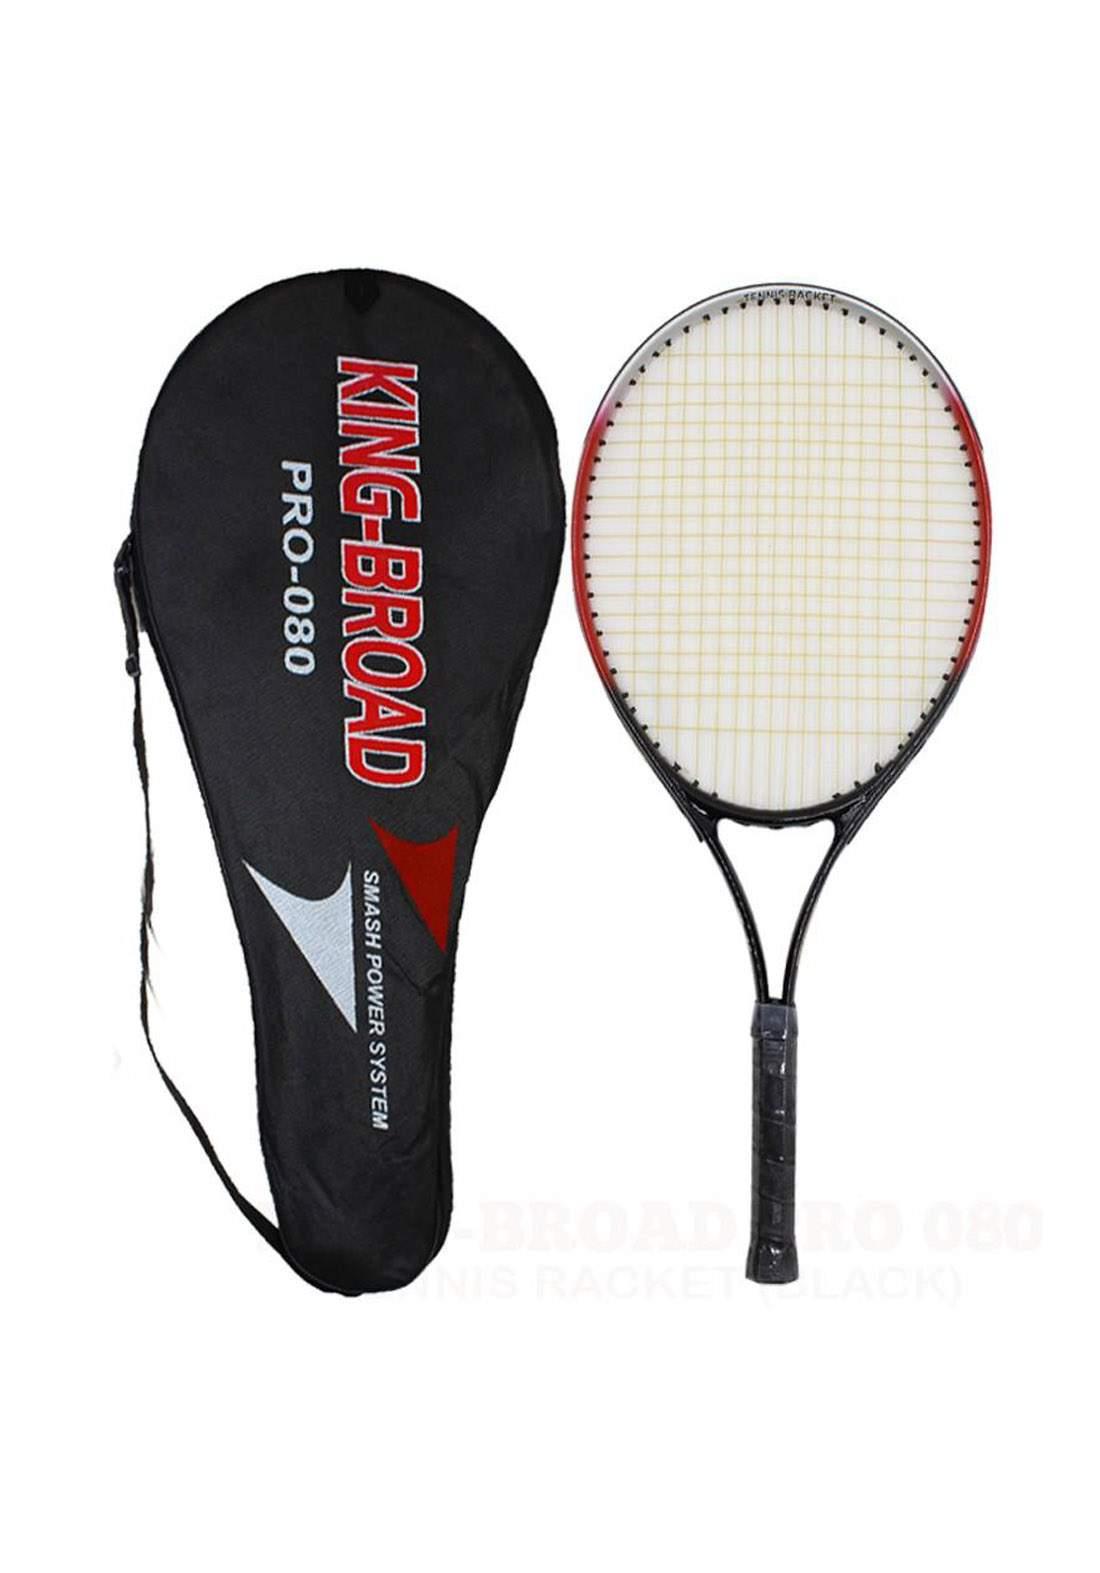 Racket Za Tennis مضرب تنس